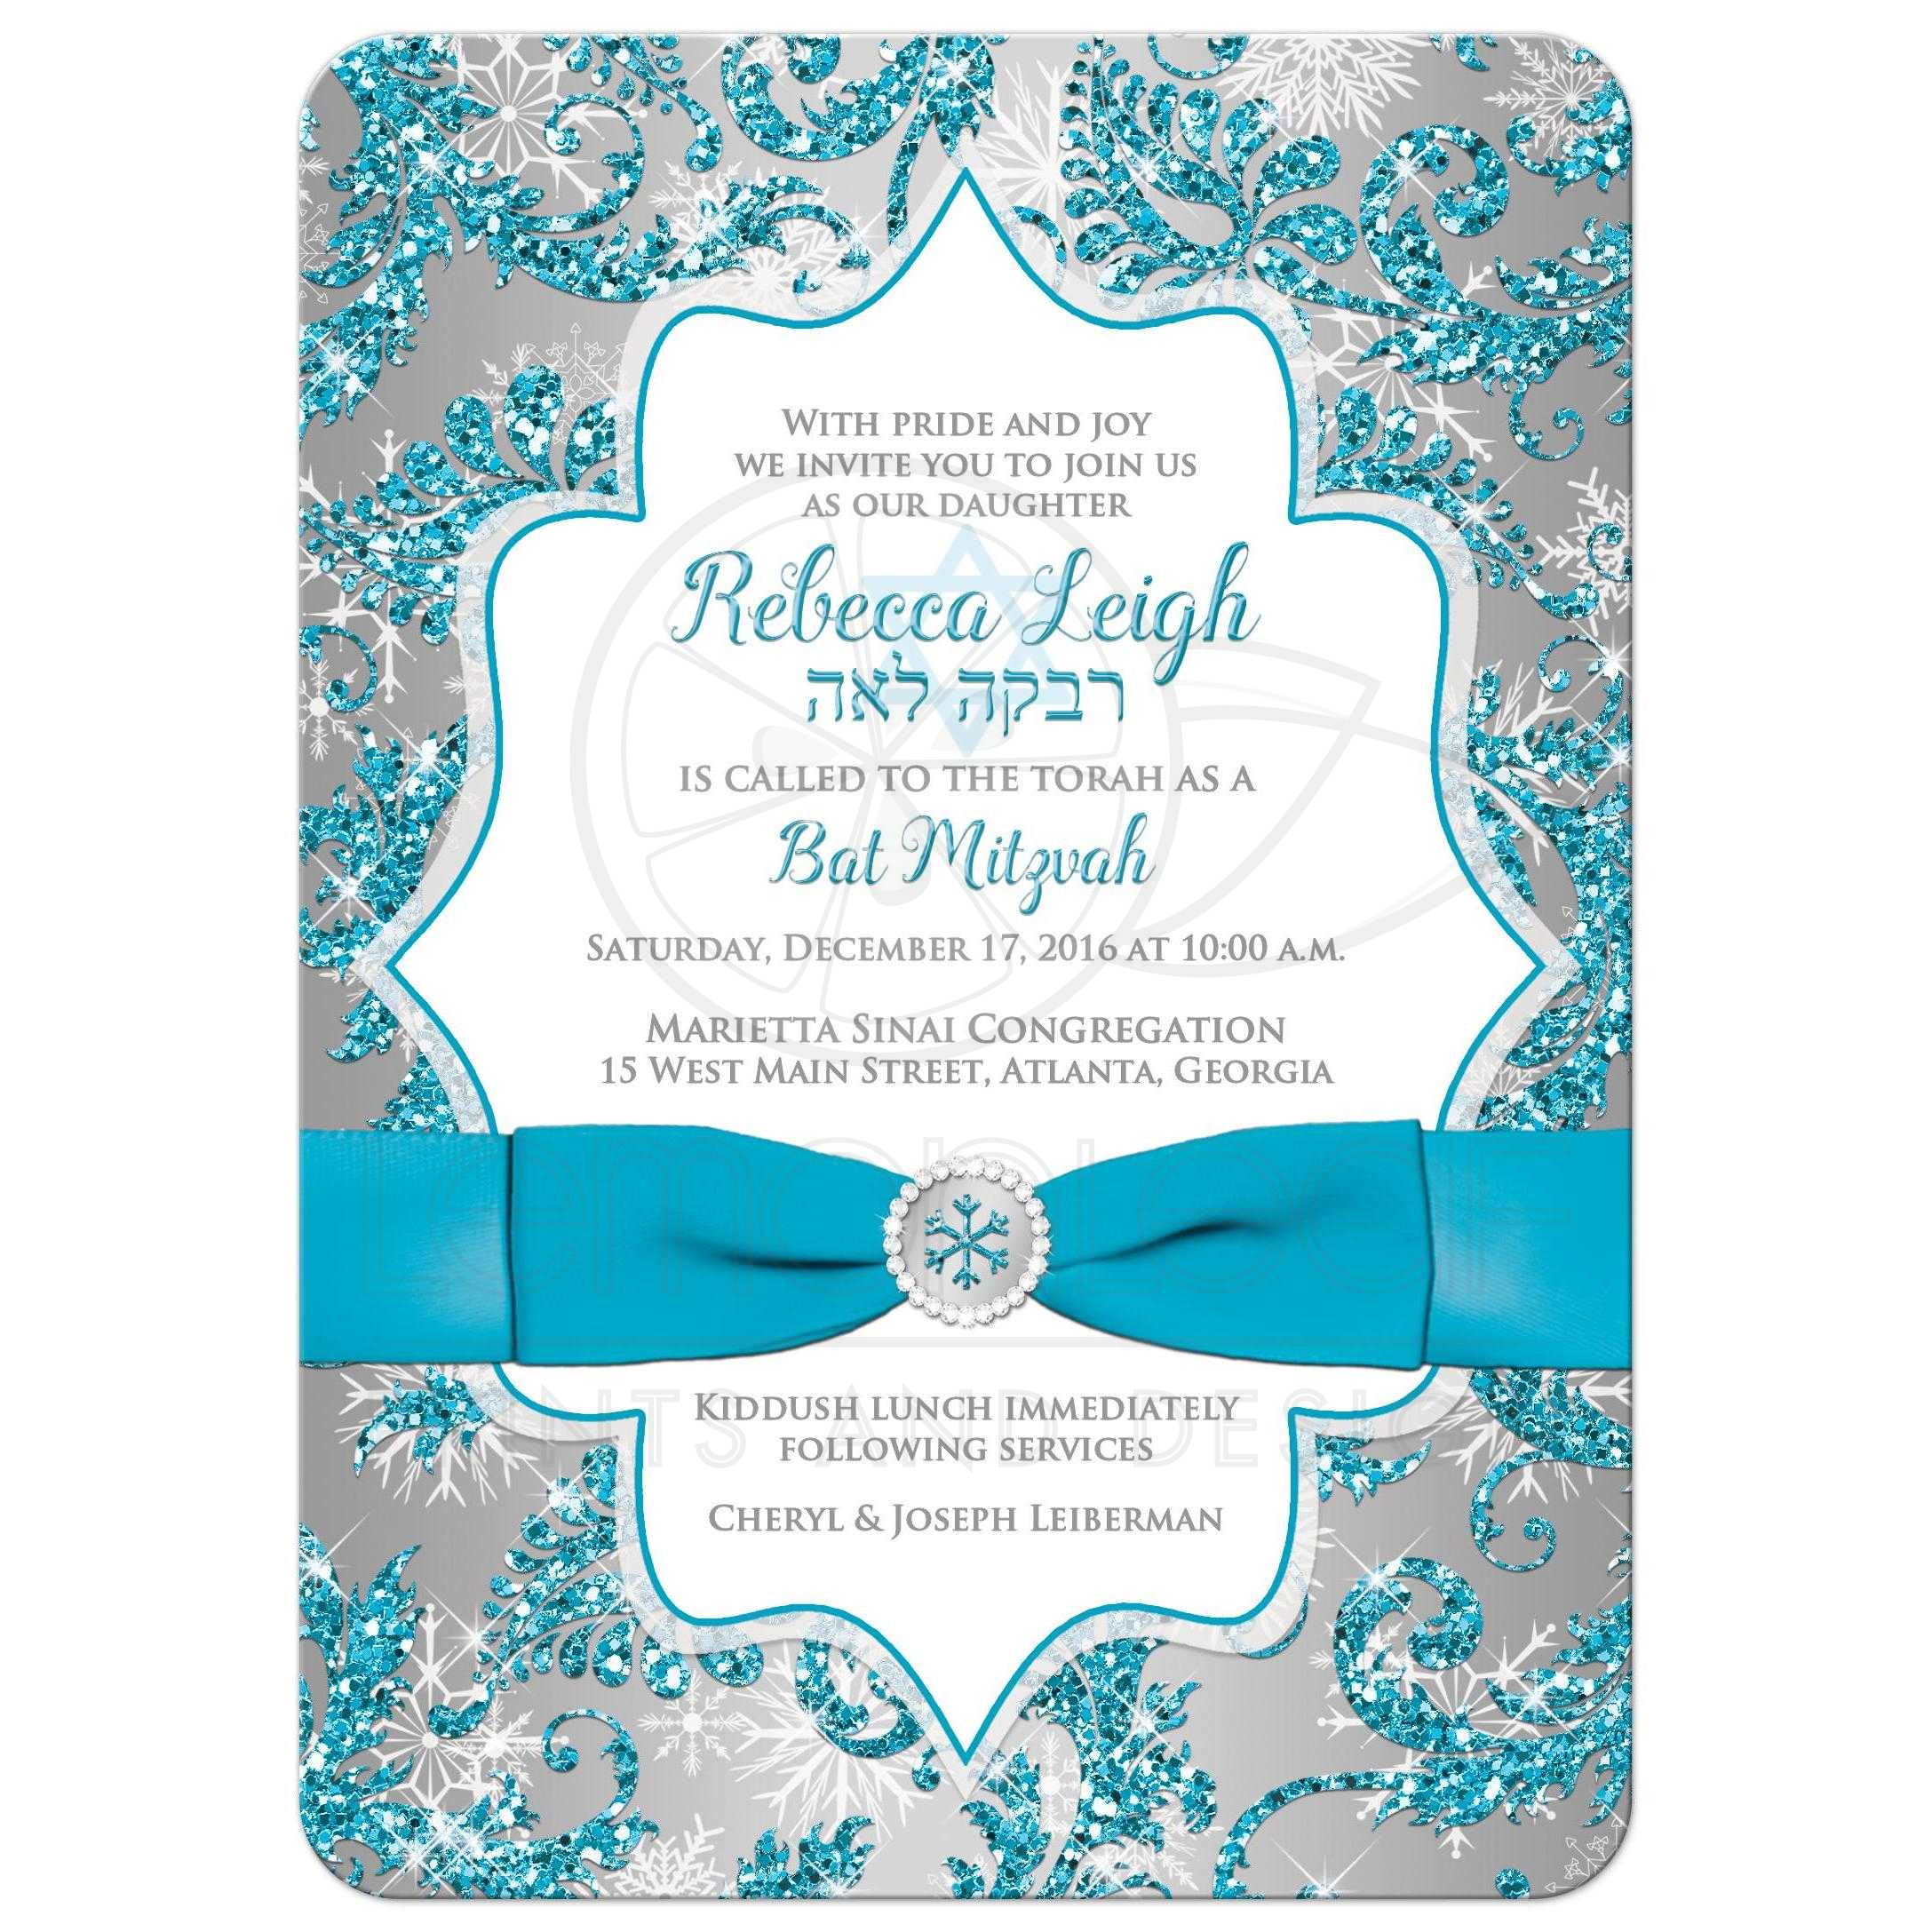 Cinderella Quinceanera Invitations was awesome invitations design